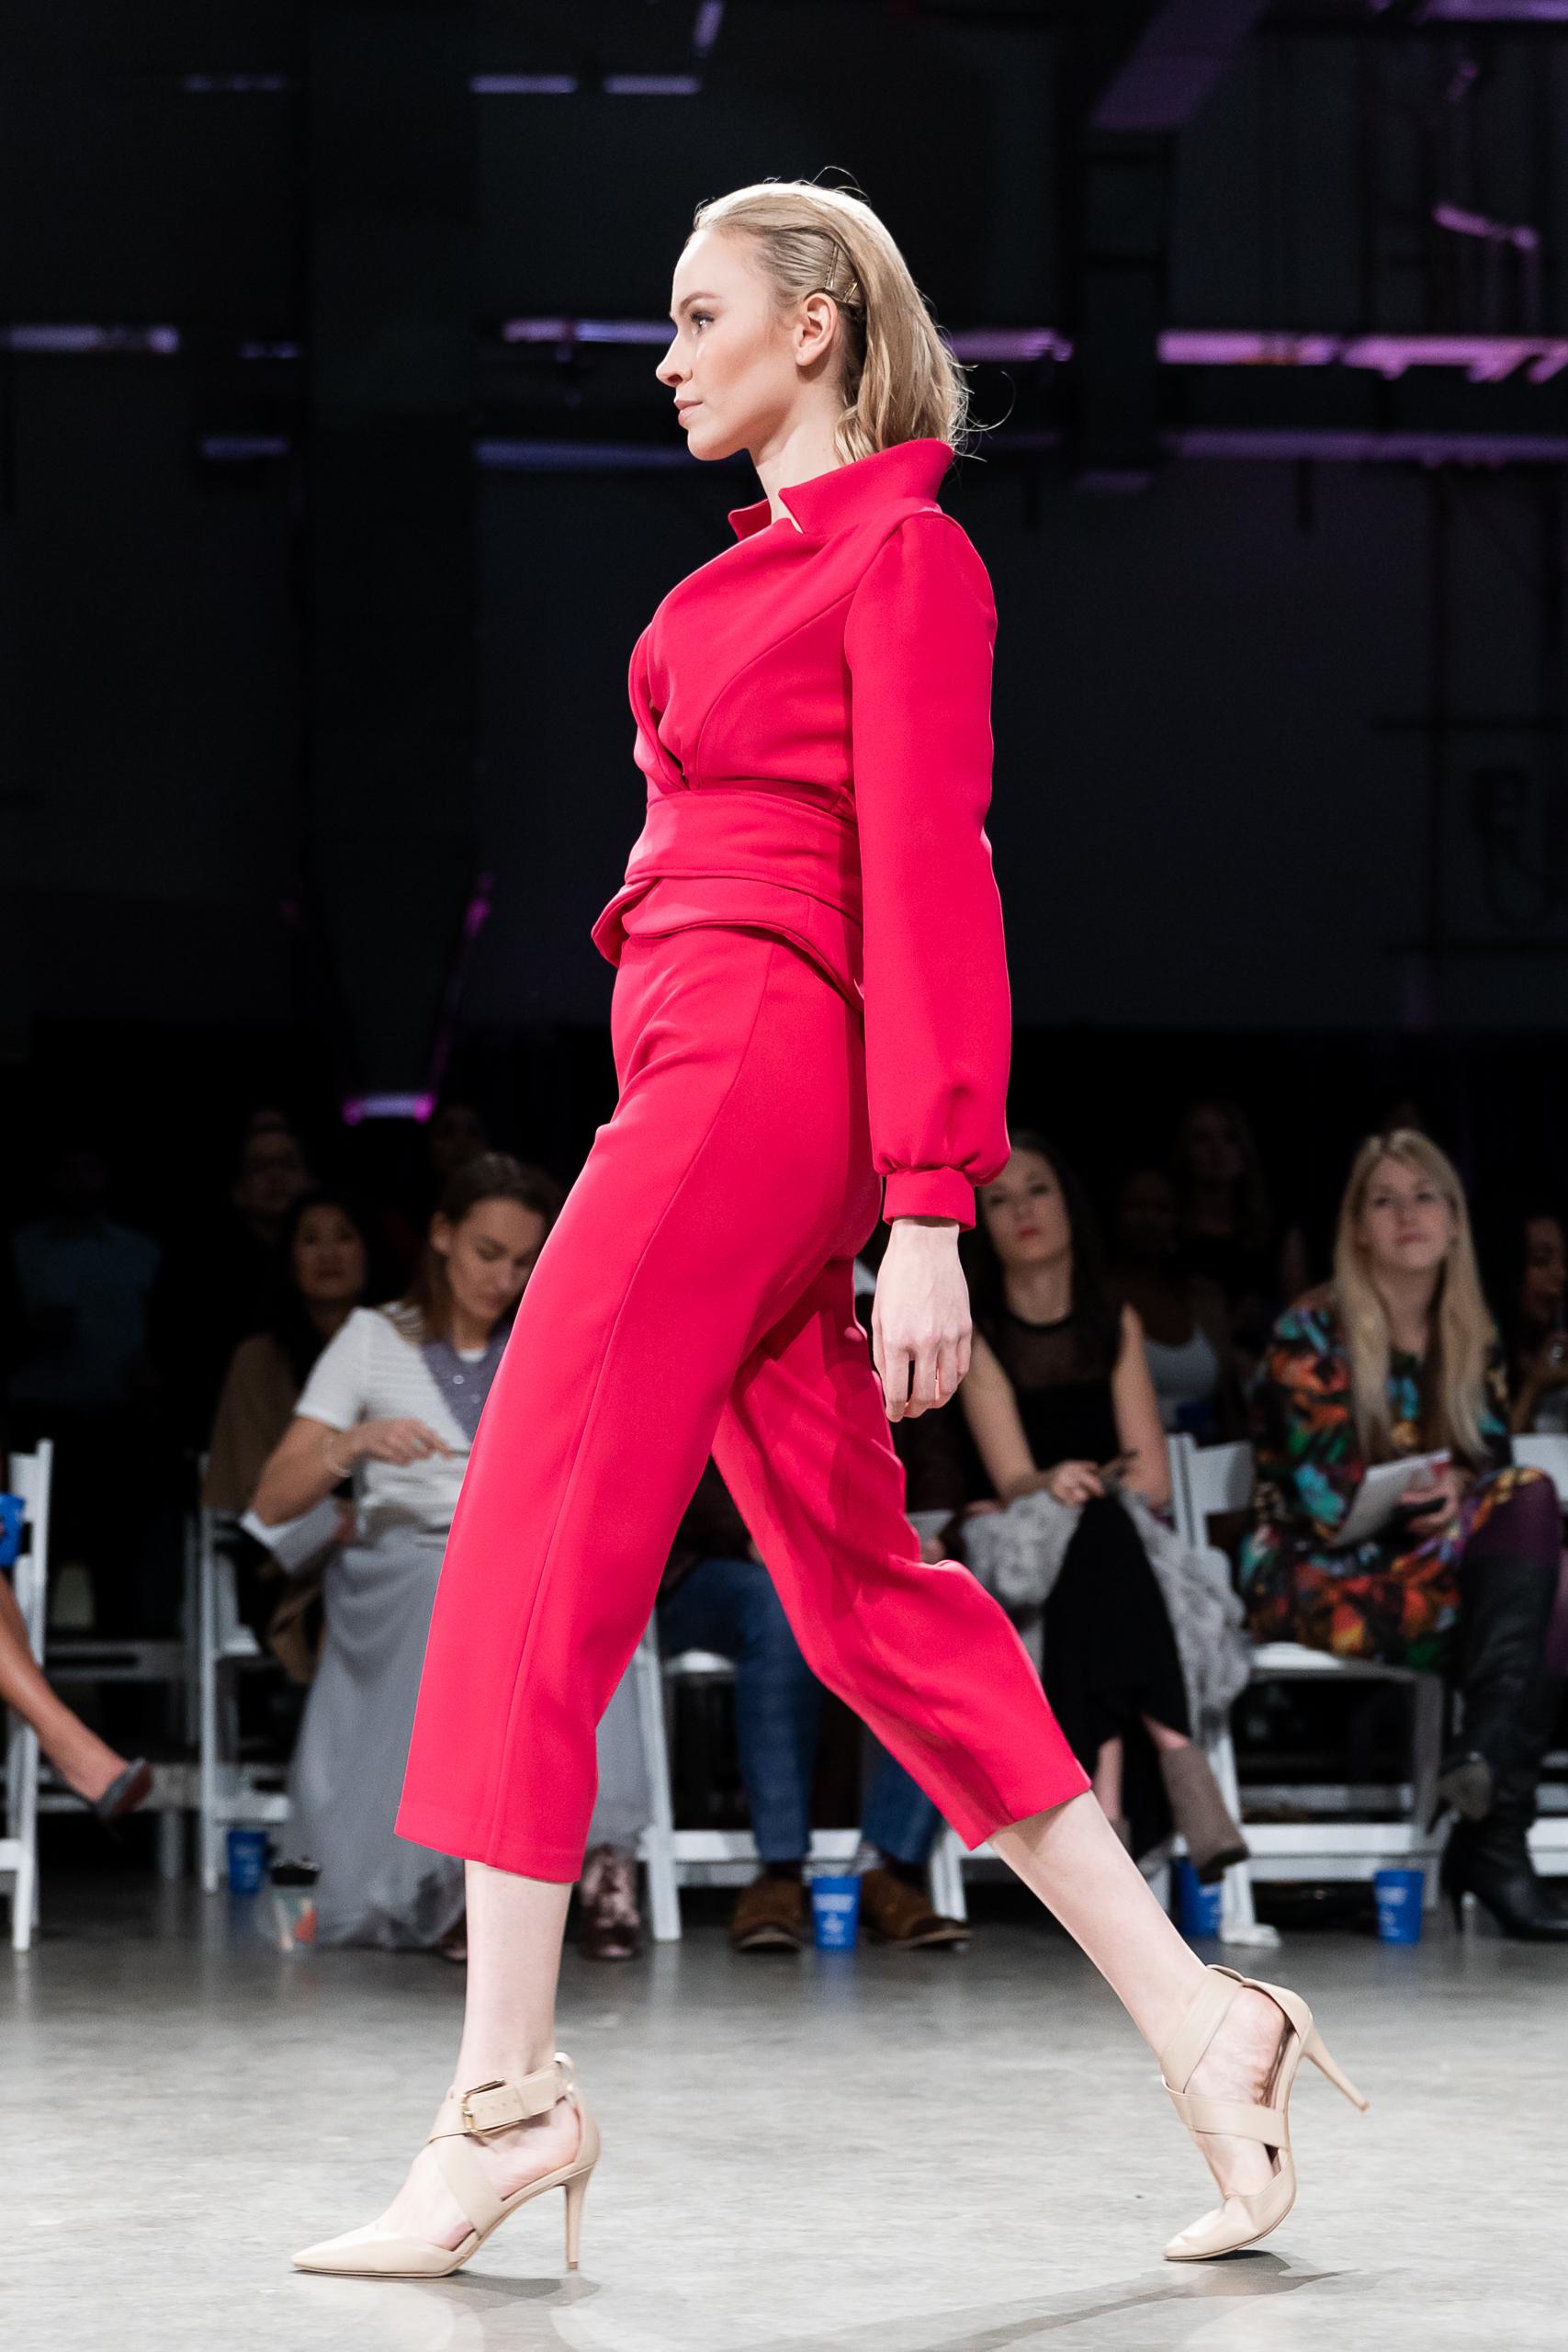 Austin Fashion Week Day 1 Zoe Annette by Linn Images-17.jpg